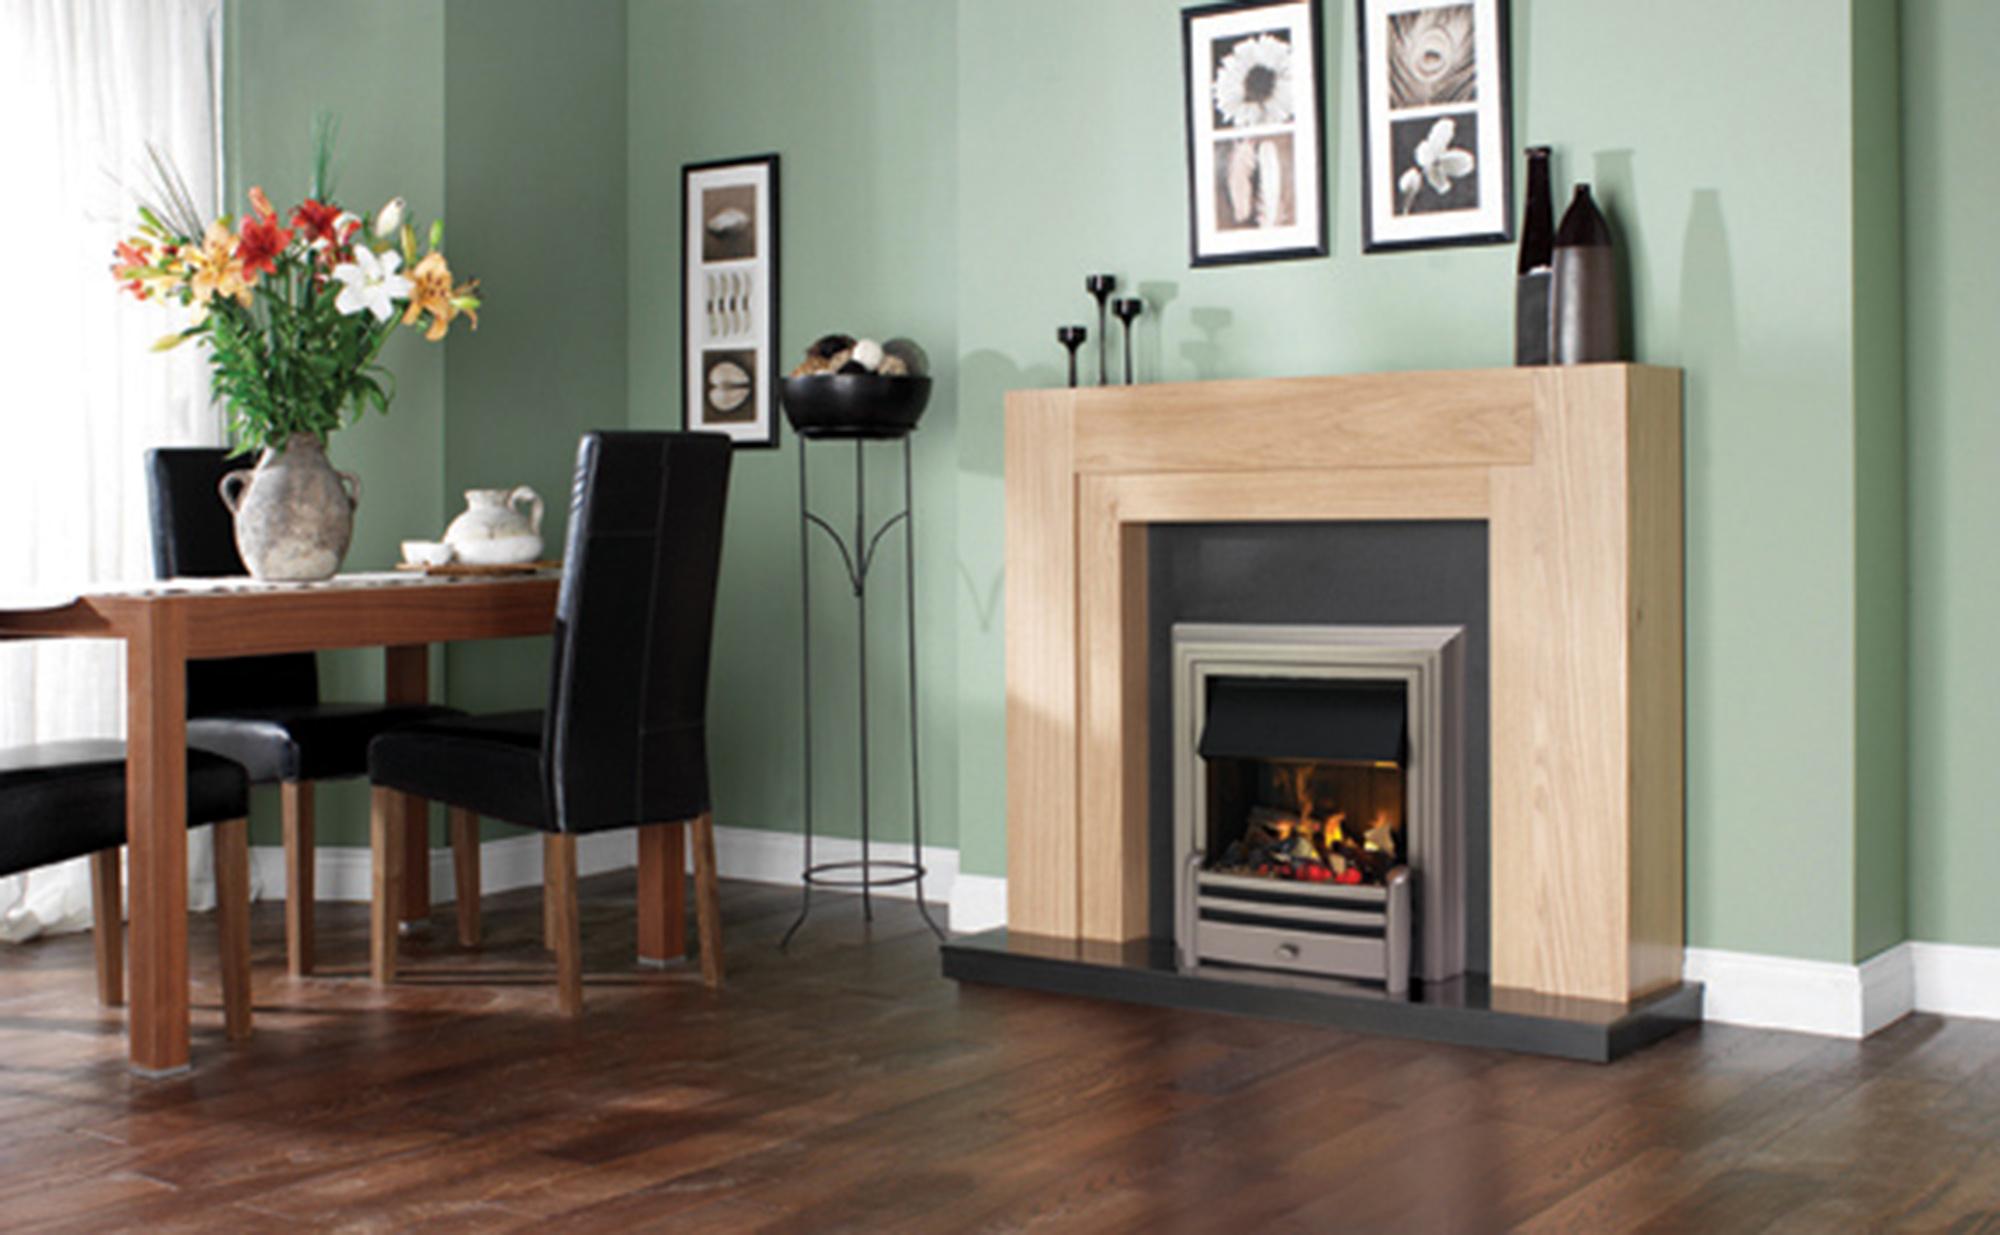 kamineinsatz chesford opti myst. Black Bedroom Furniture Sets. Home Design Ideas